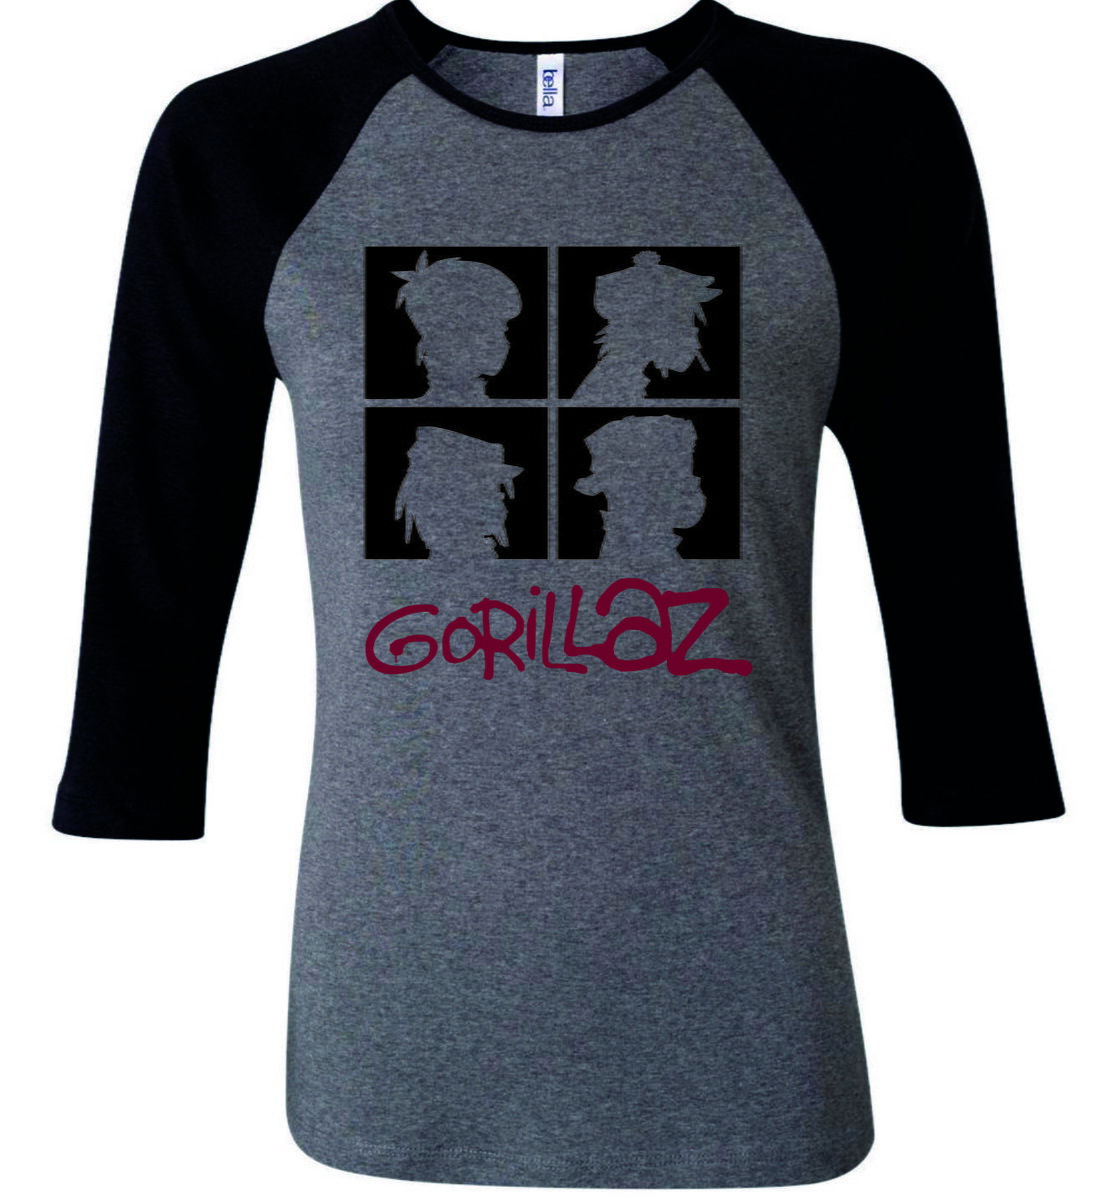 Camiseta Raglan 3 4 Cinz Banda Gorillaz  2 - Camisa Feminina no Elo7 ... 07805fca0d412